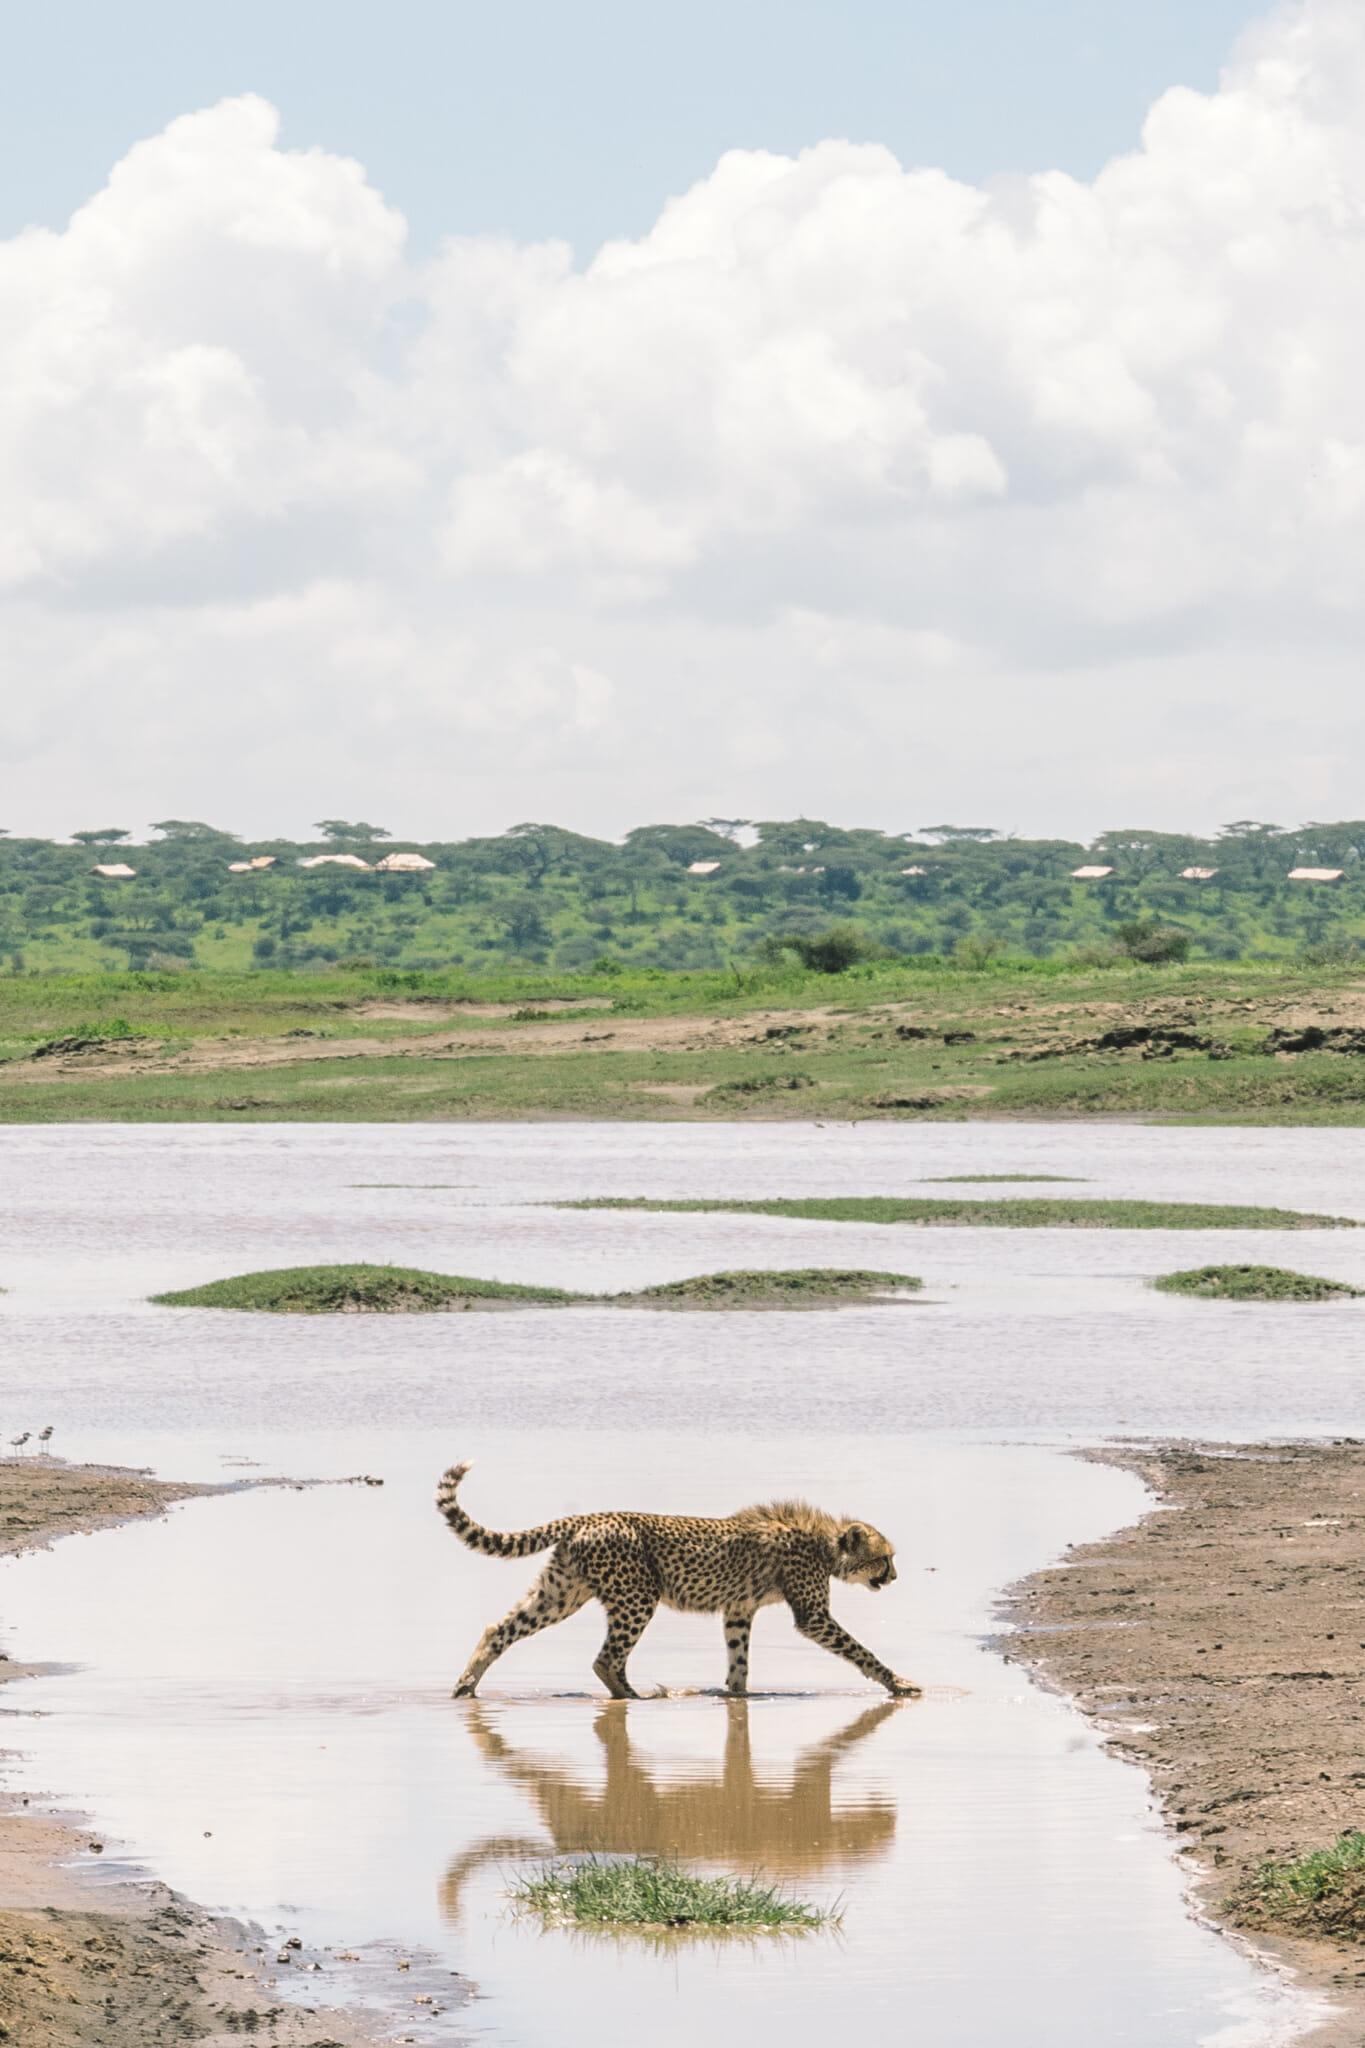 Guépard marchant dans l'eau dans la zone du Ndutu en Tanzanie